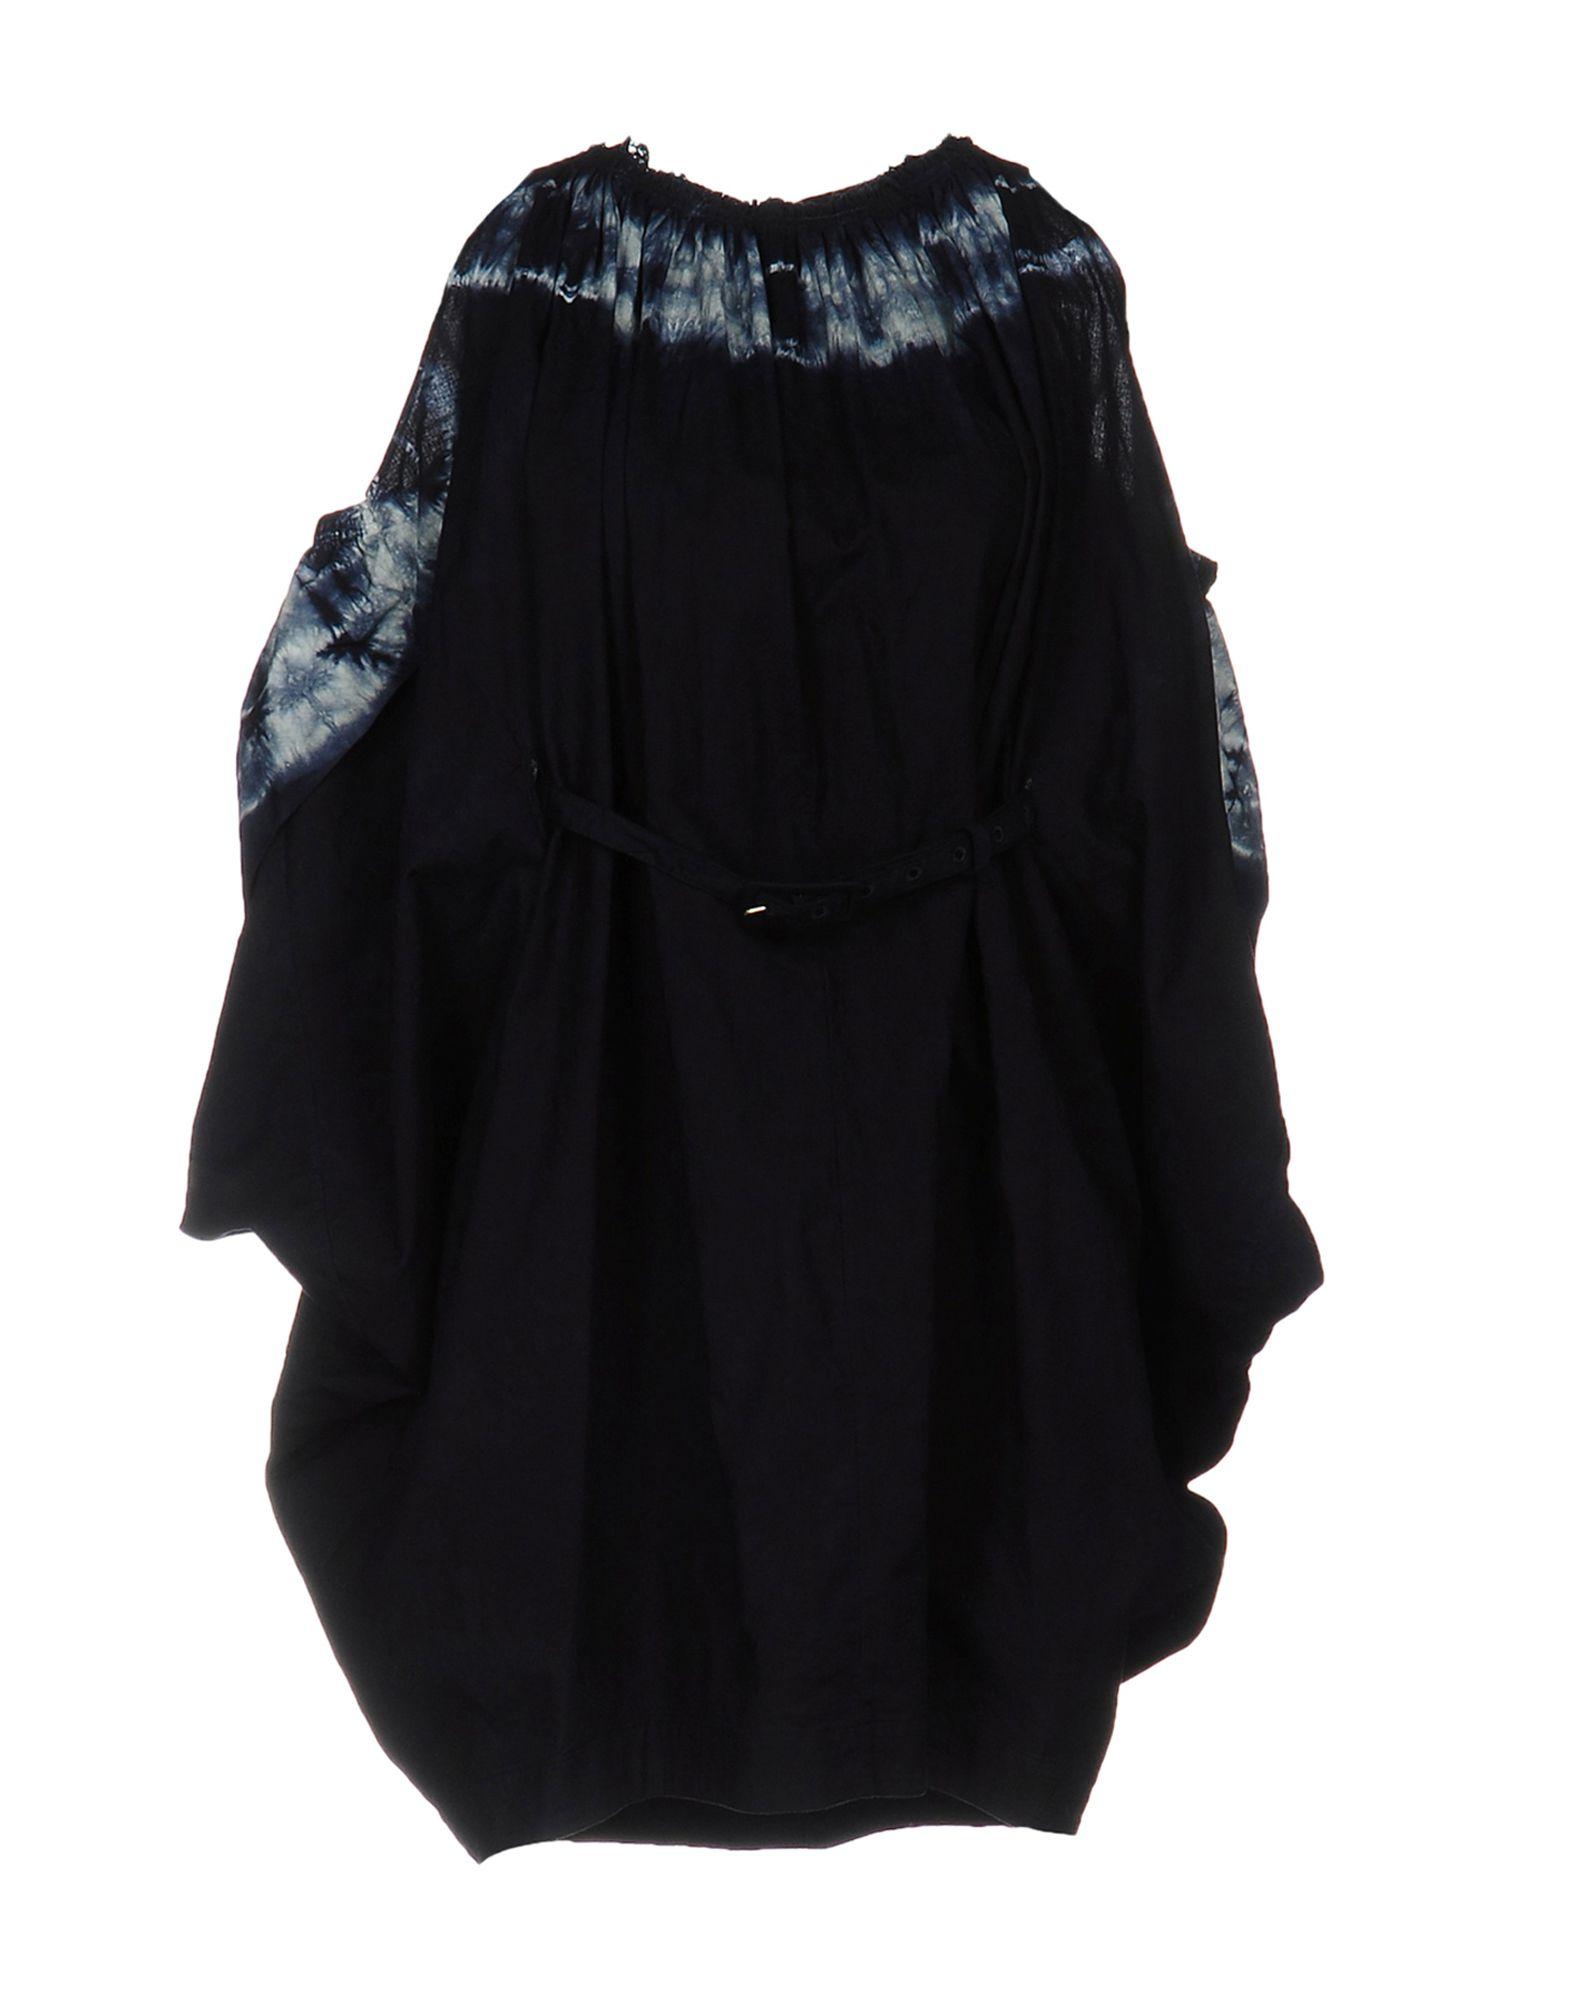 Vestito Corto Rachel Comey Donna - Acquista online su 8Yf86ENVO